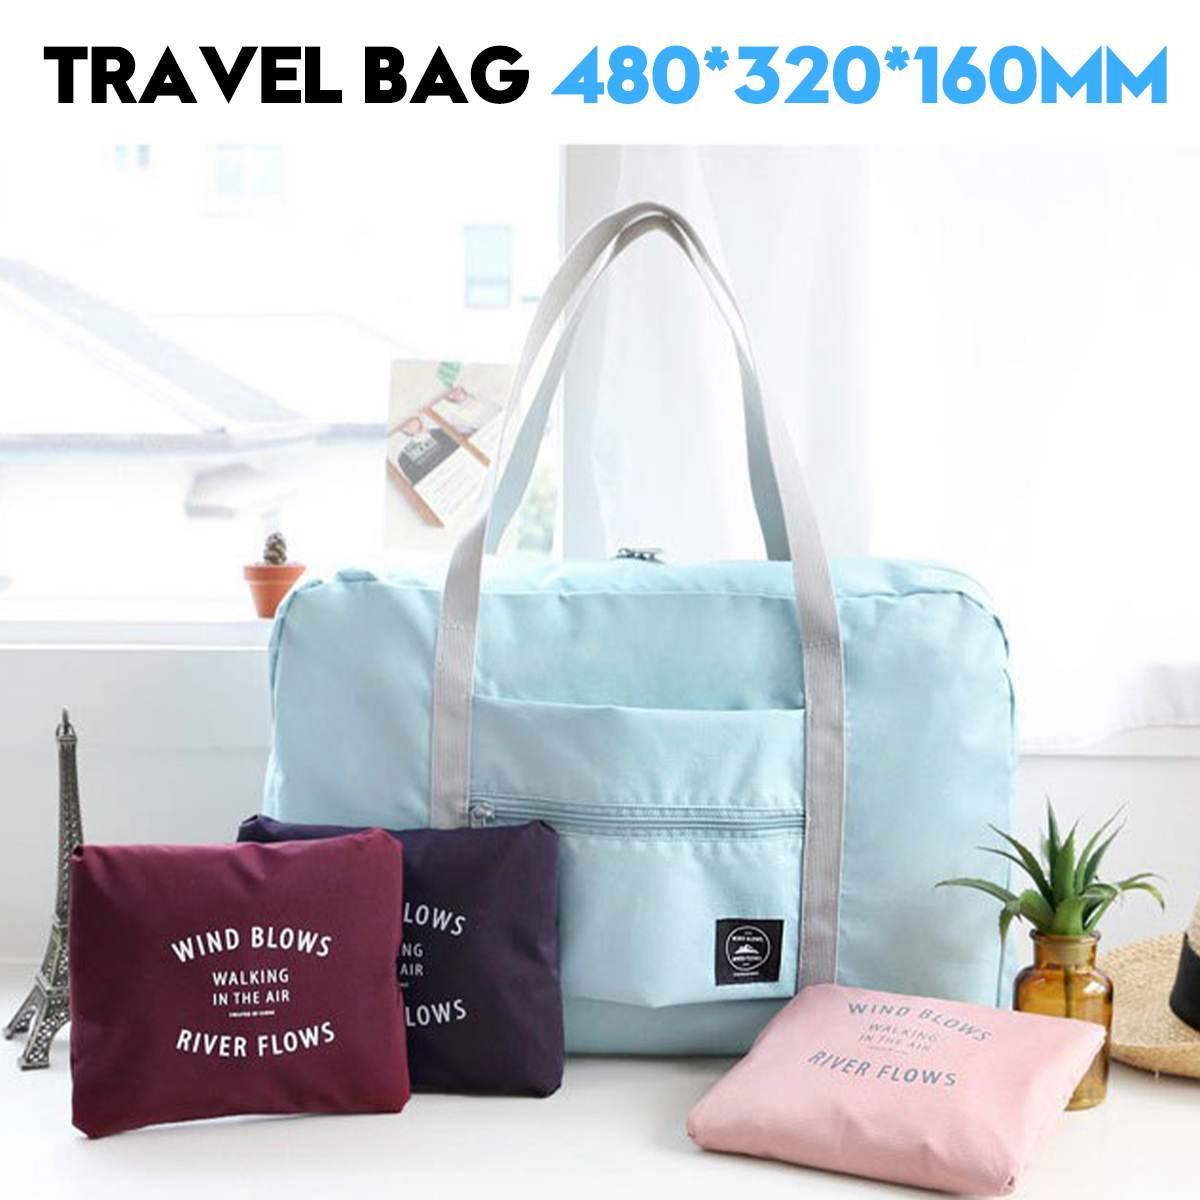 Waterproof Oxford Cloth Tote Duffle Bag Shoulder Handbag Luggage Unisex Large Capacity Travel Gym Sport Bags